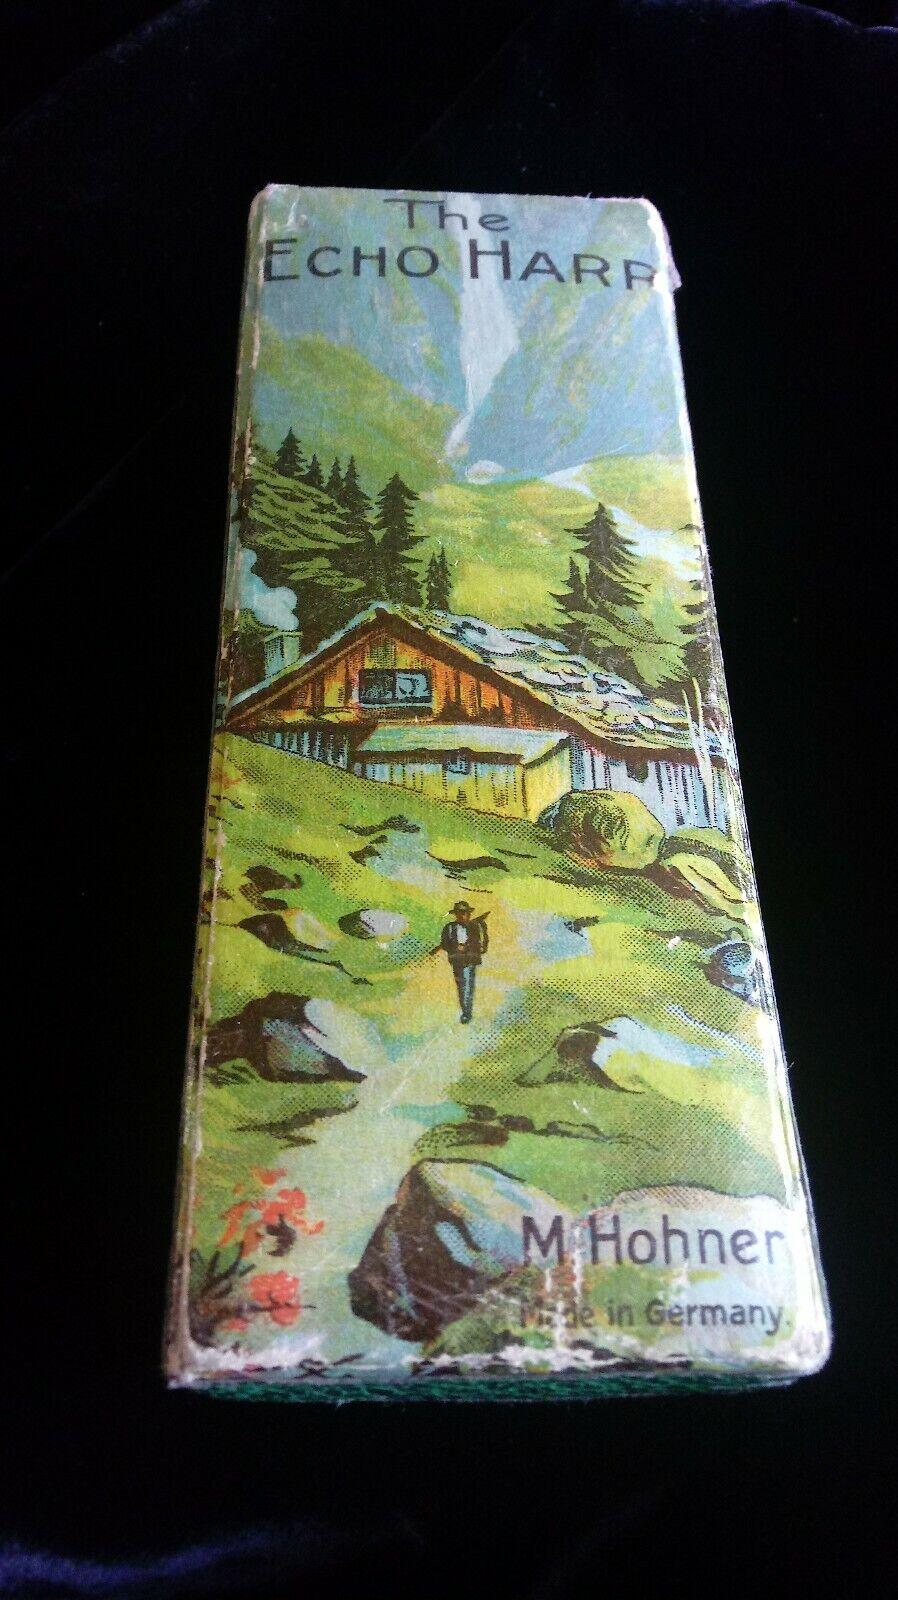 Vintage The Echo Harp Harmonica von M. Hohner in Original Box, Made in Germany